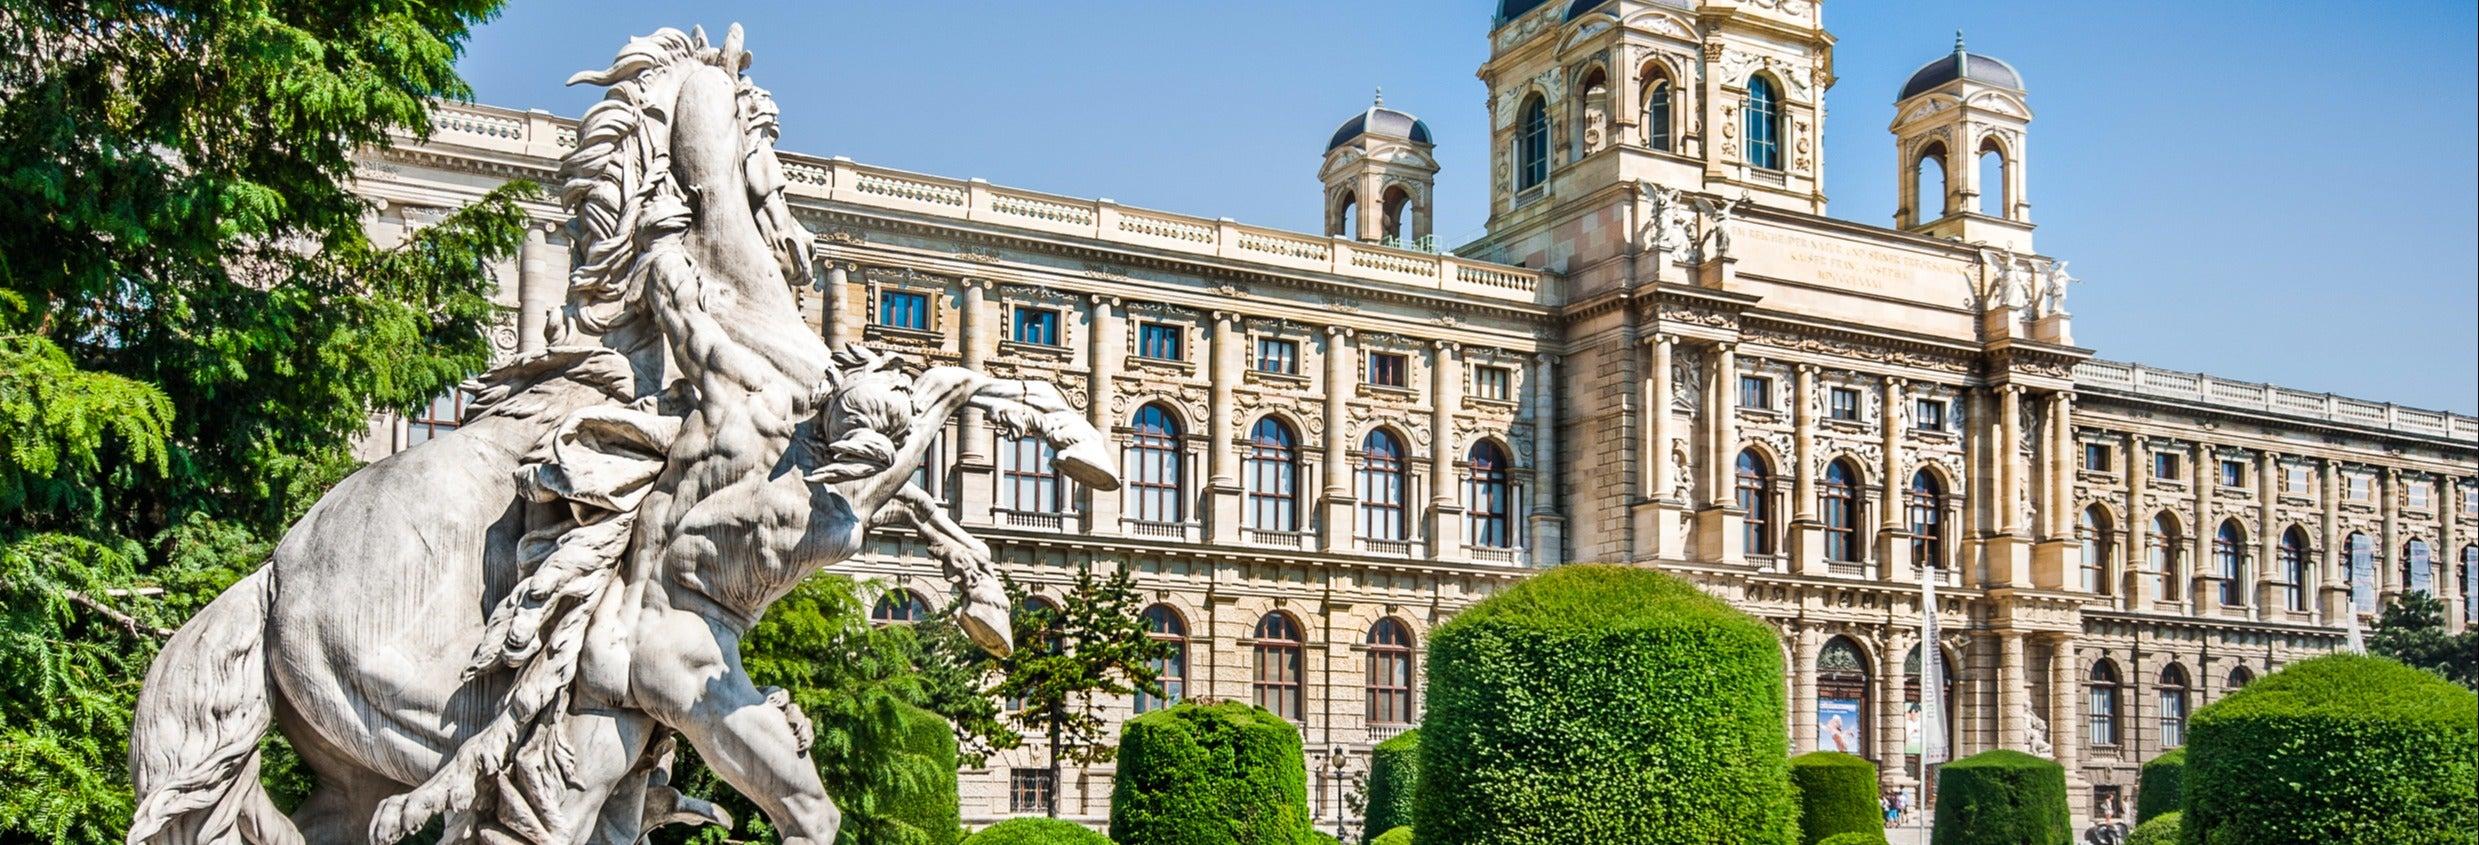 Excursão a Viena